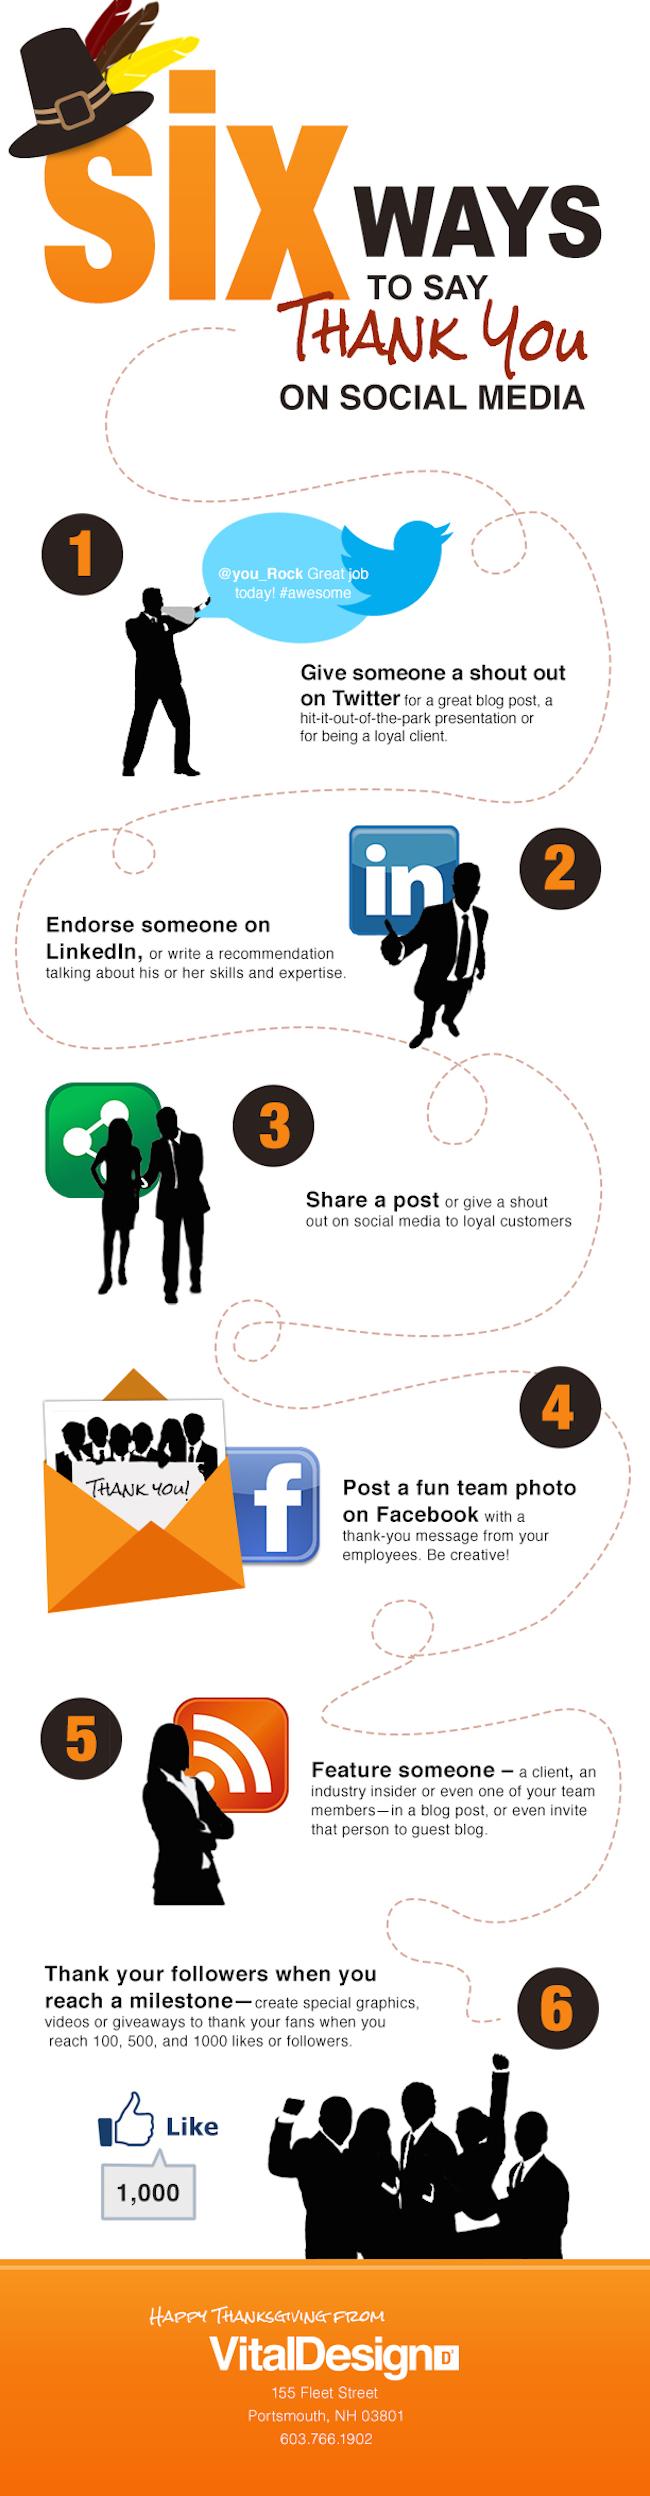 social-thankyou-infographic-02